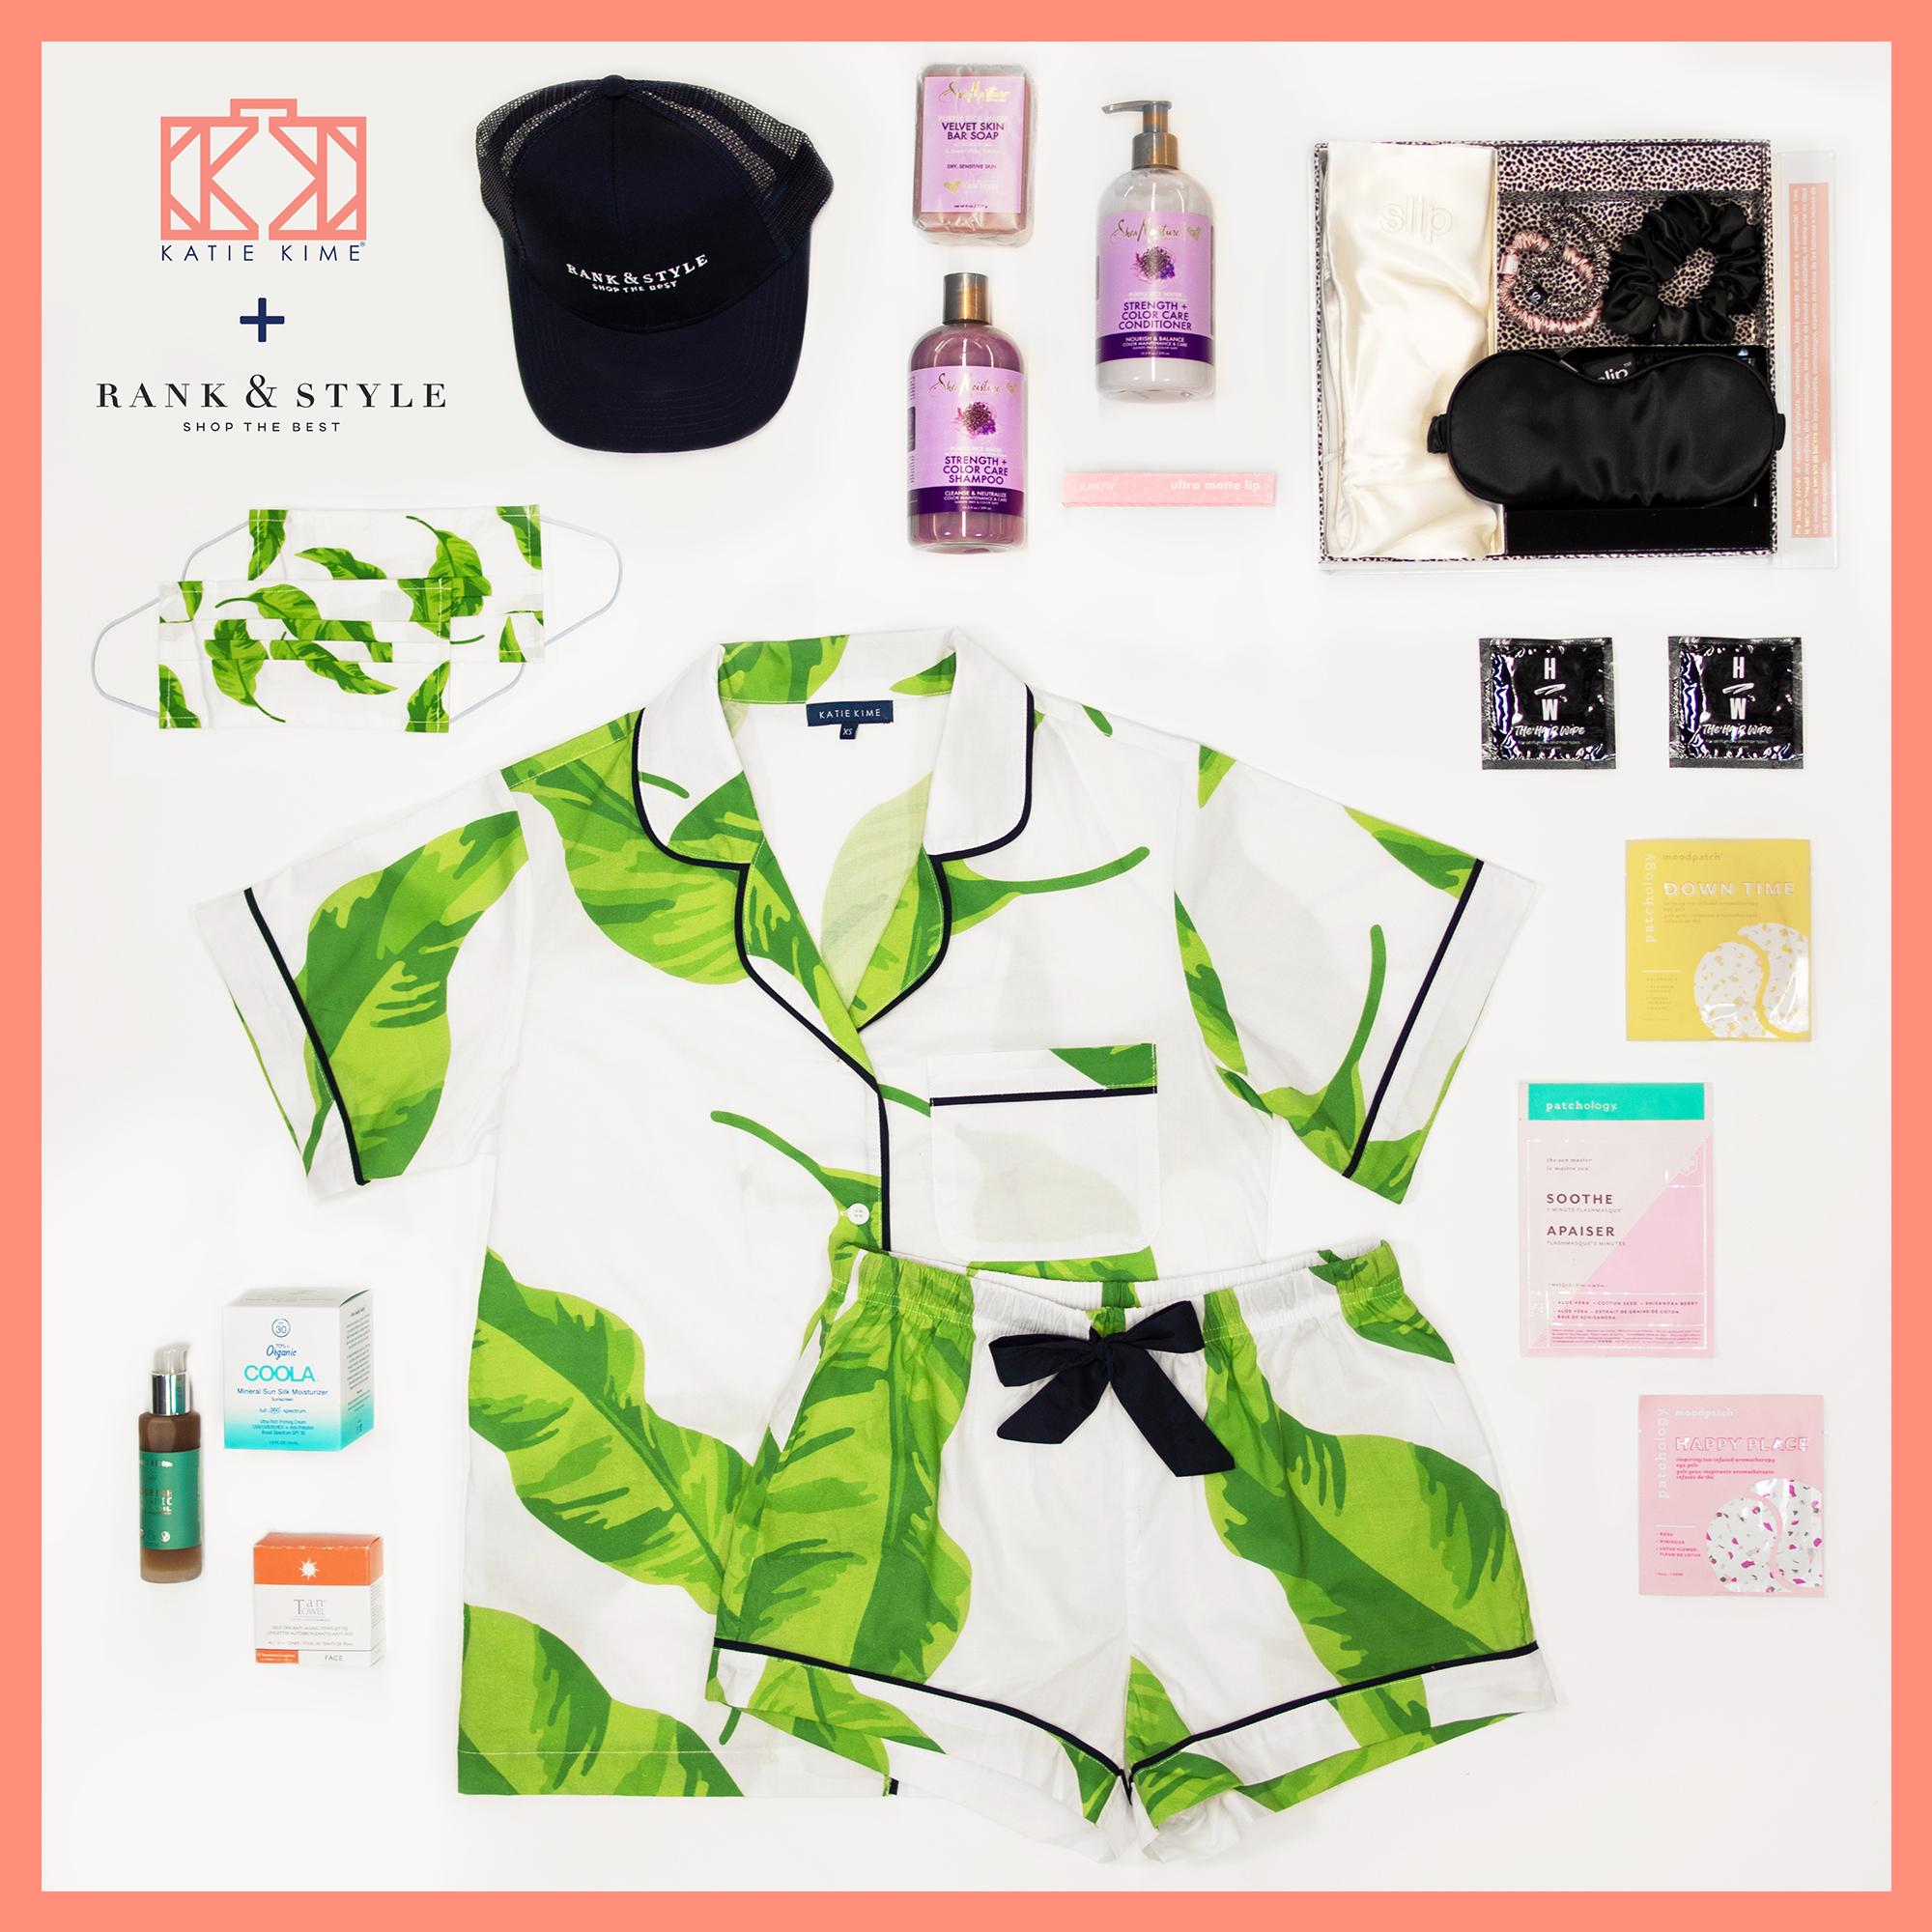 Katie Kime x Rank & Style Giveaway